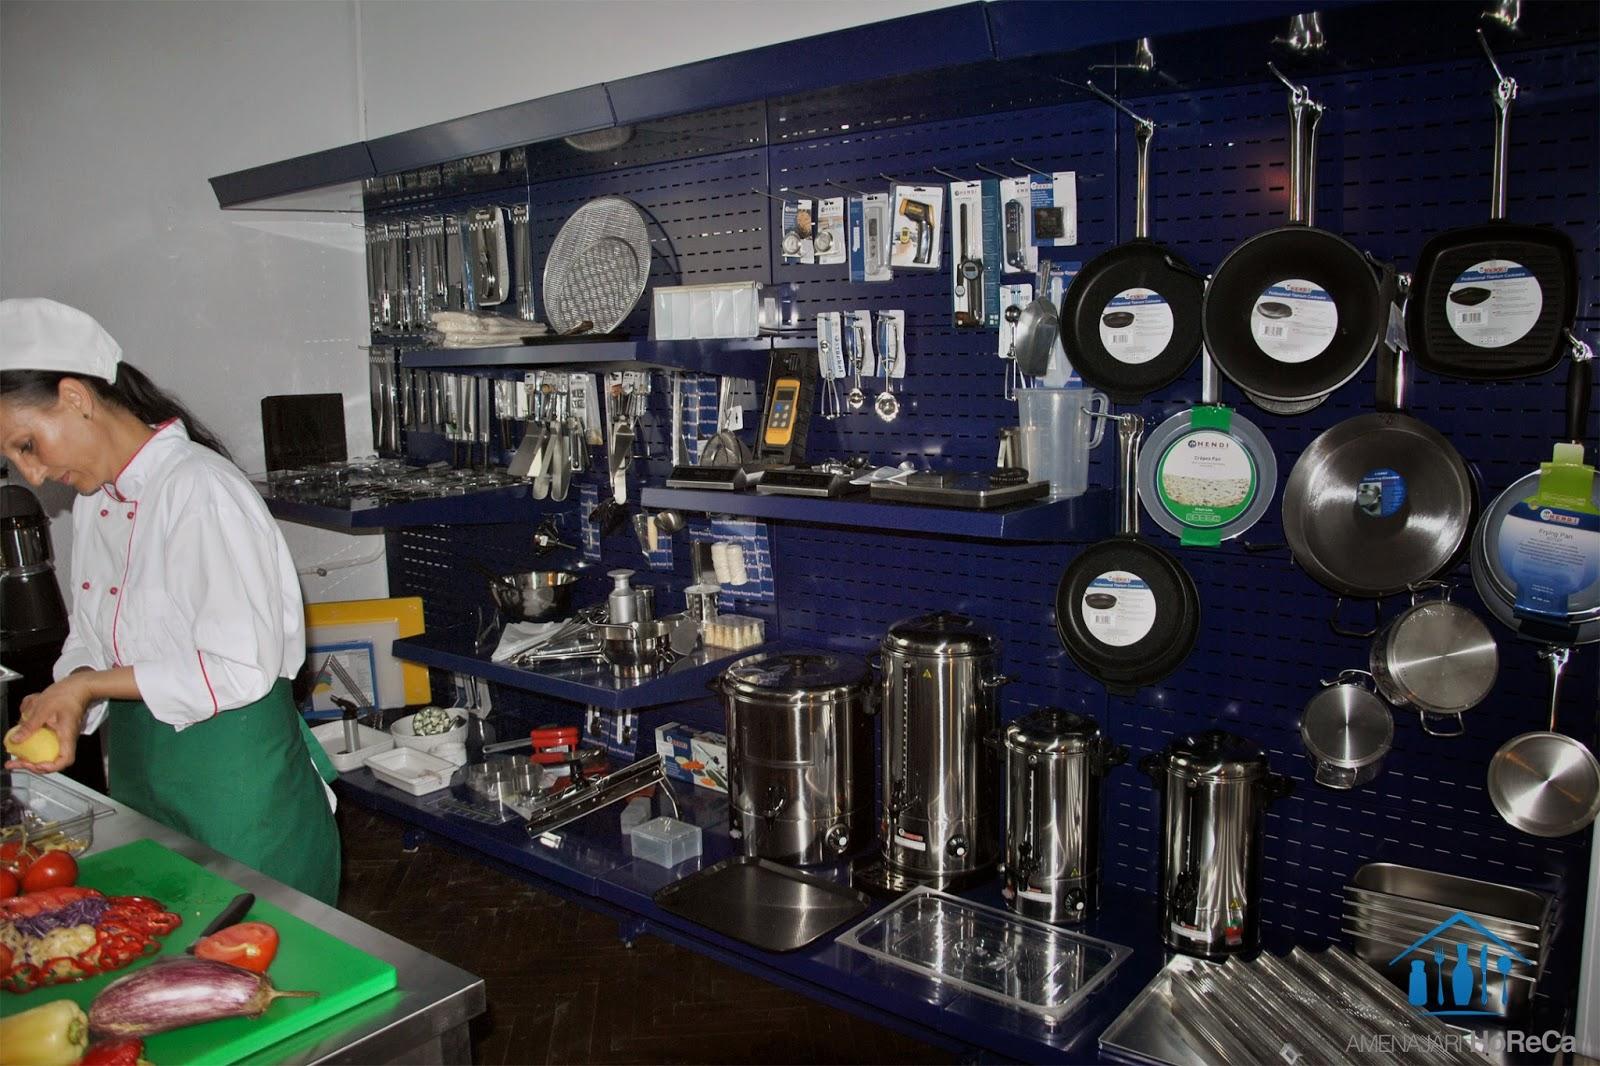 Testare de Accesorii Horeca pentru Bucatarii Profesionale, Showroom Amenajari Horeca in Bucuresti